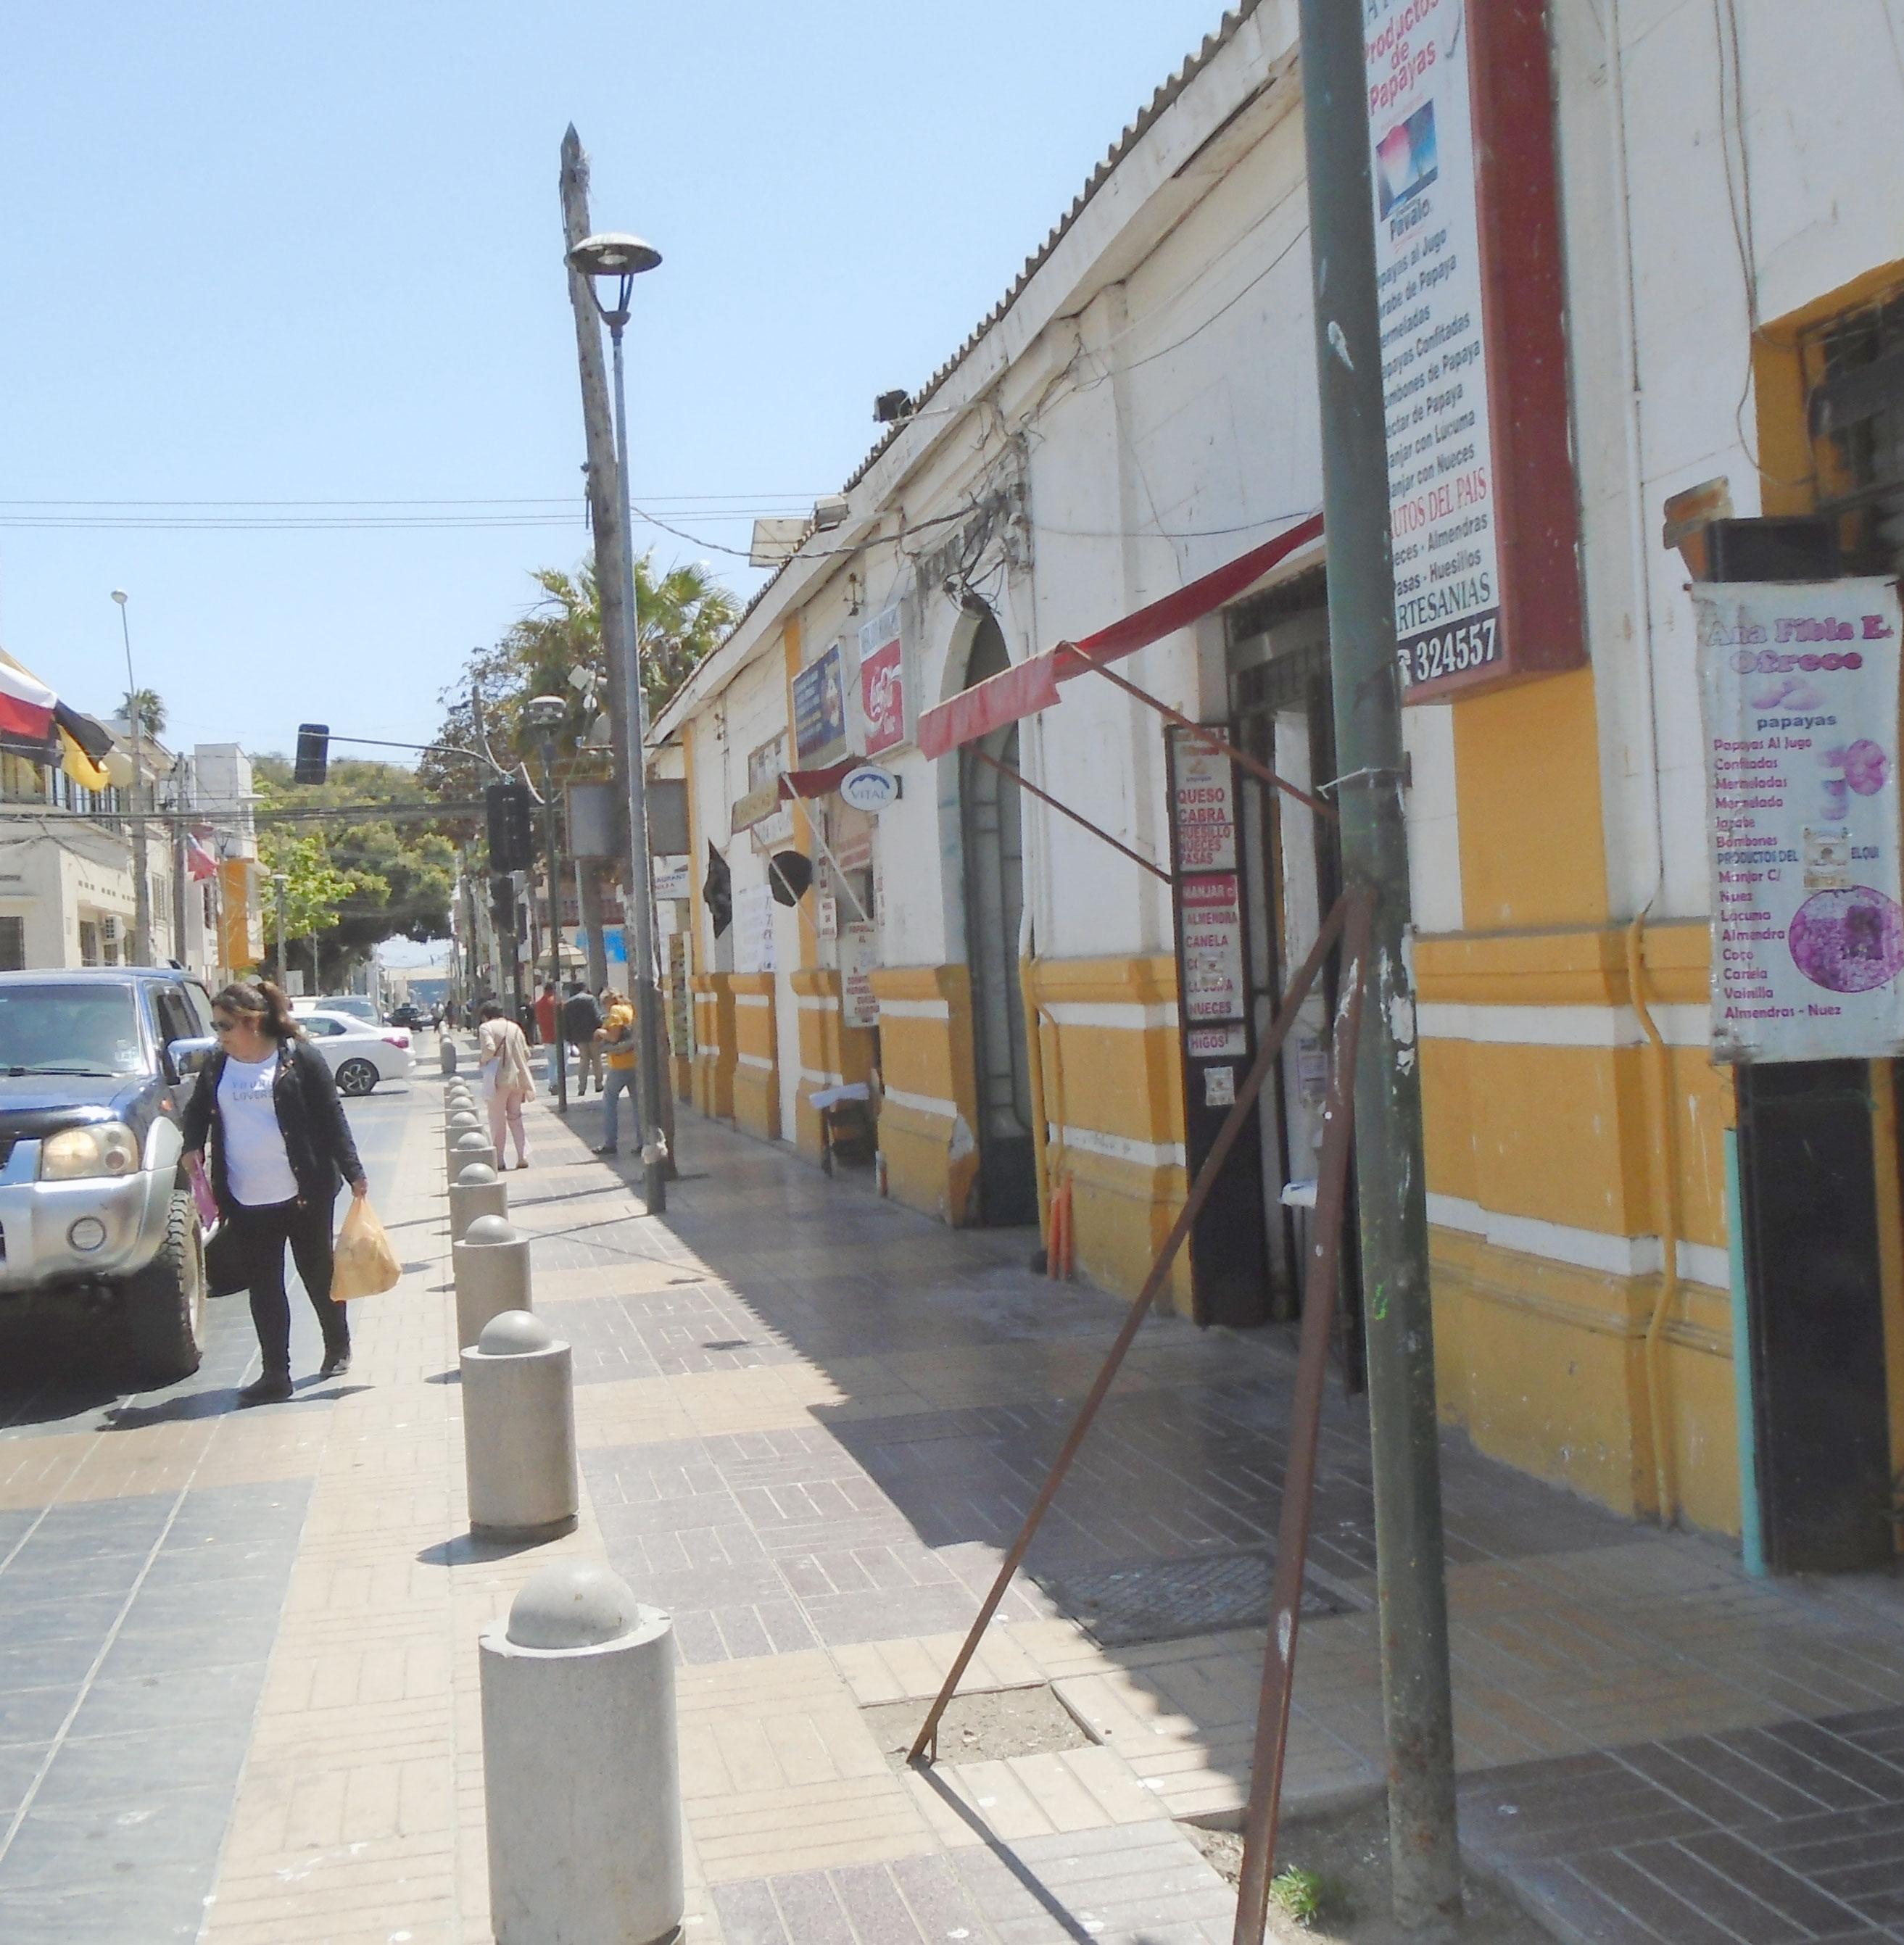 Comerciantes del ex mercado municipal de Coquimbo siguen en la incertidumbre de su futuro - http://www.diariolaregion.cl